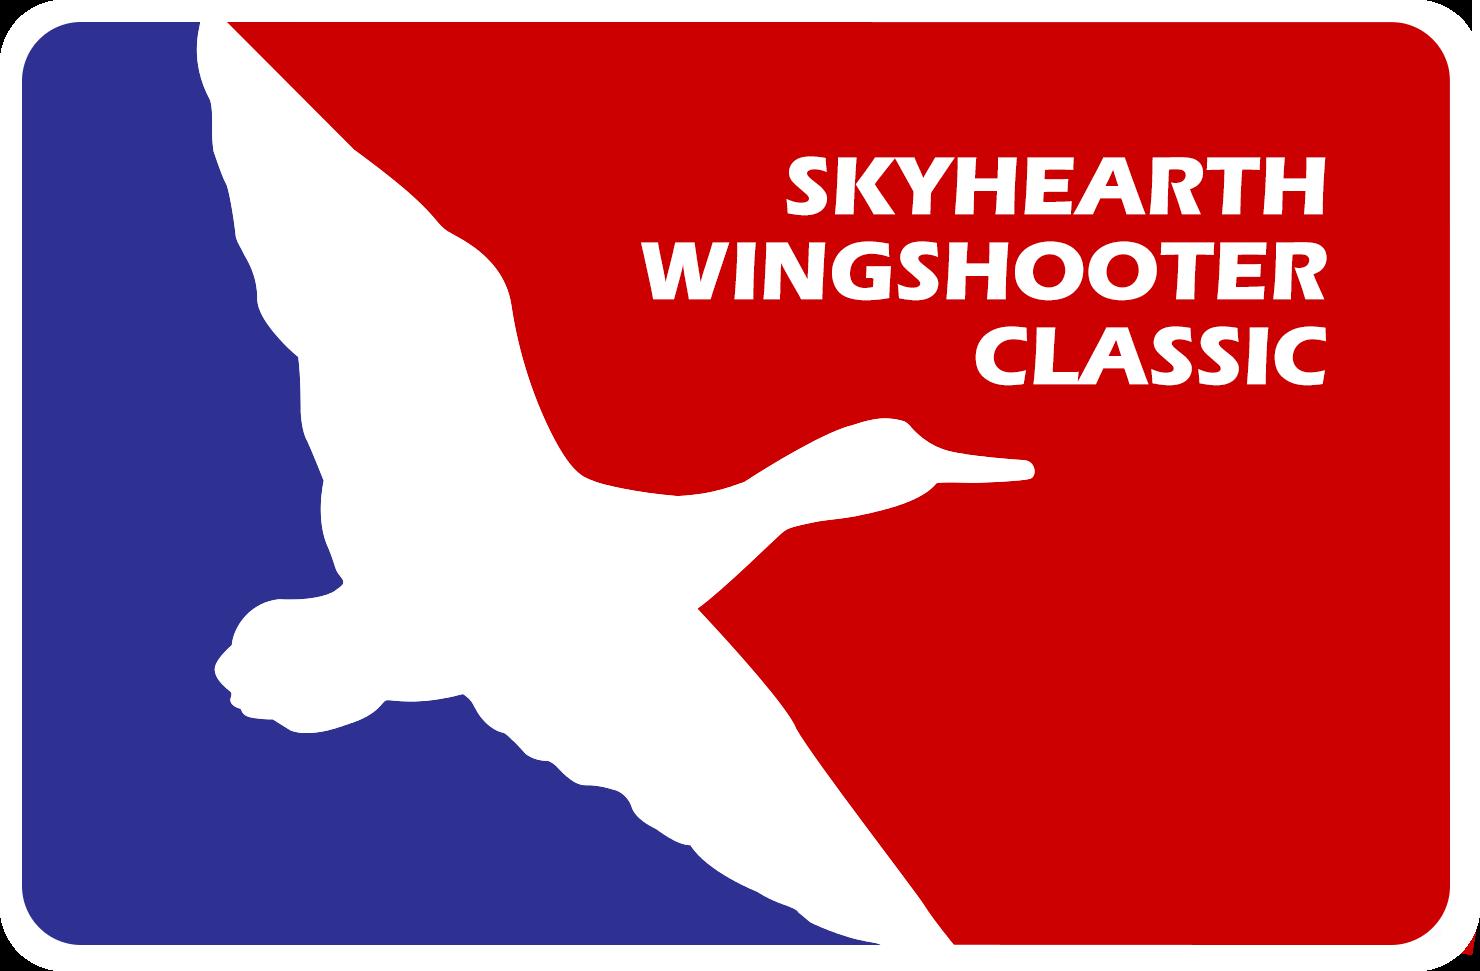 Skyhearth Wingshooter Classic Hi